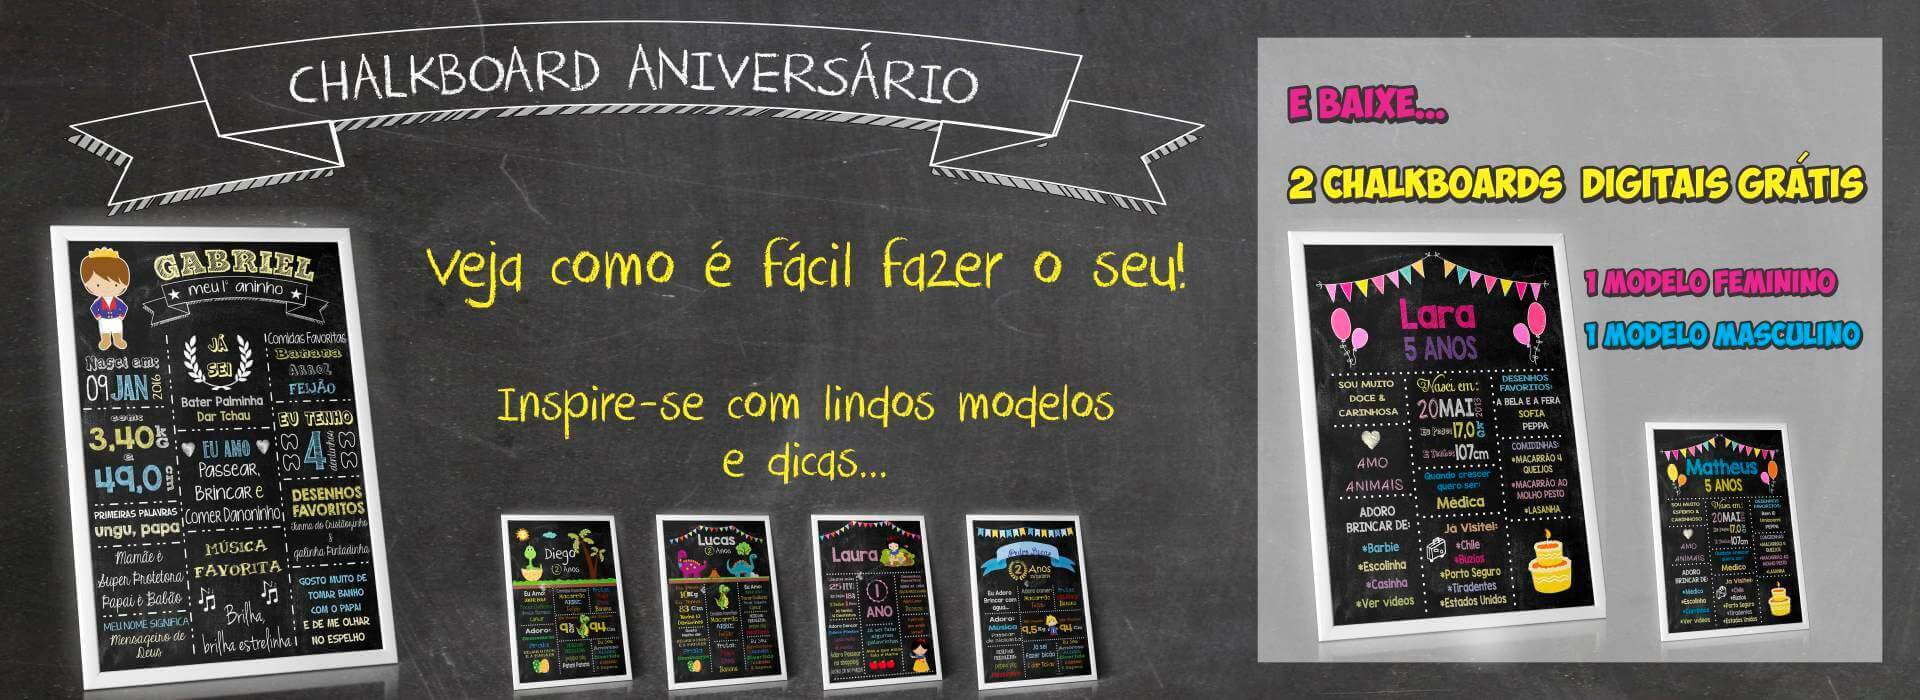 chalkboard aniversario infantil chalkboard gratis chalkboard digital